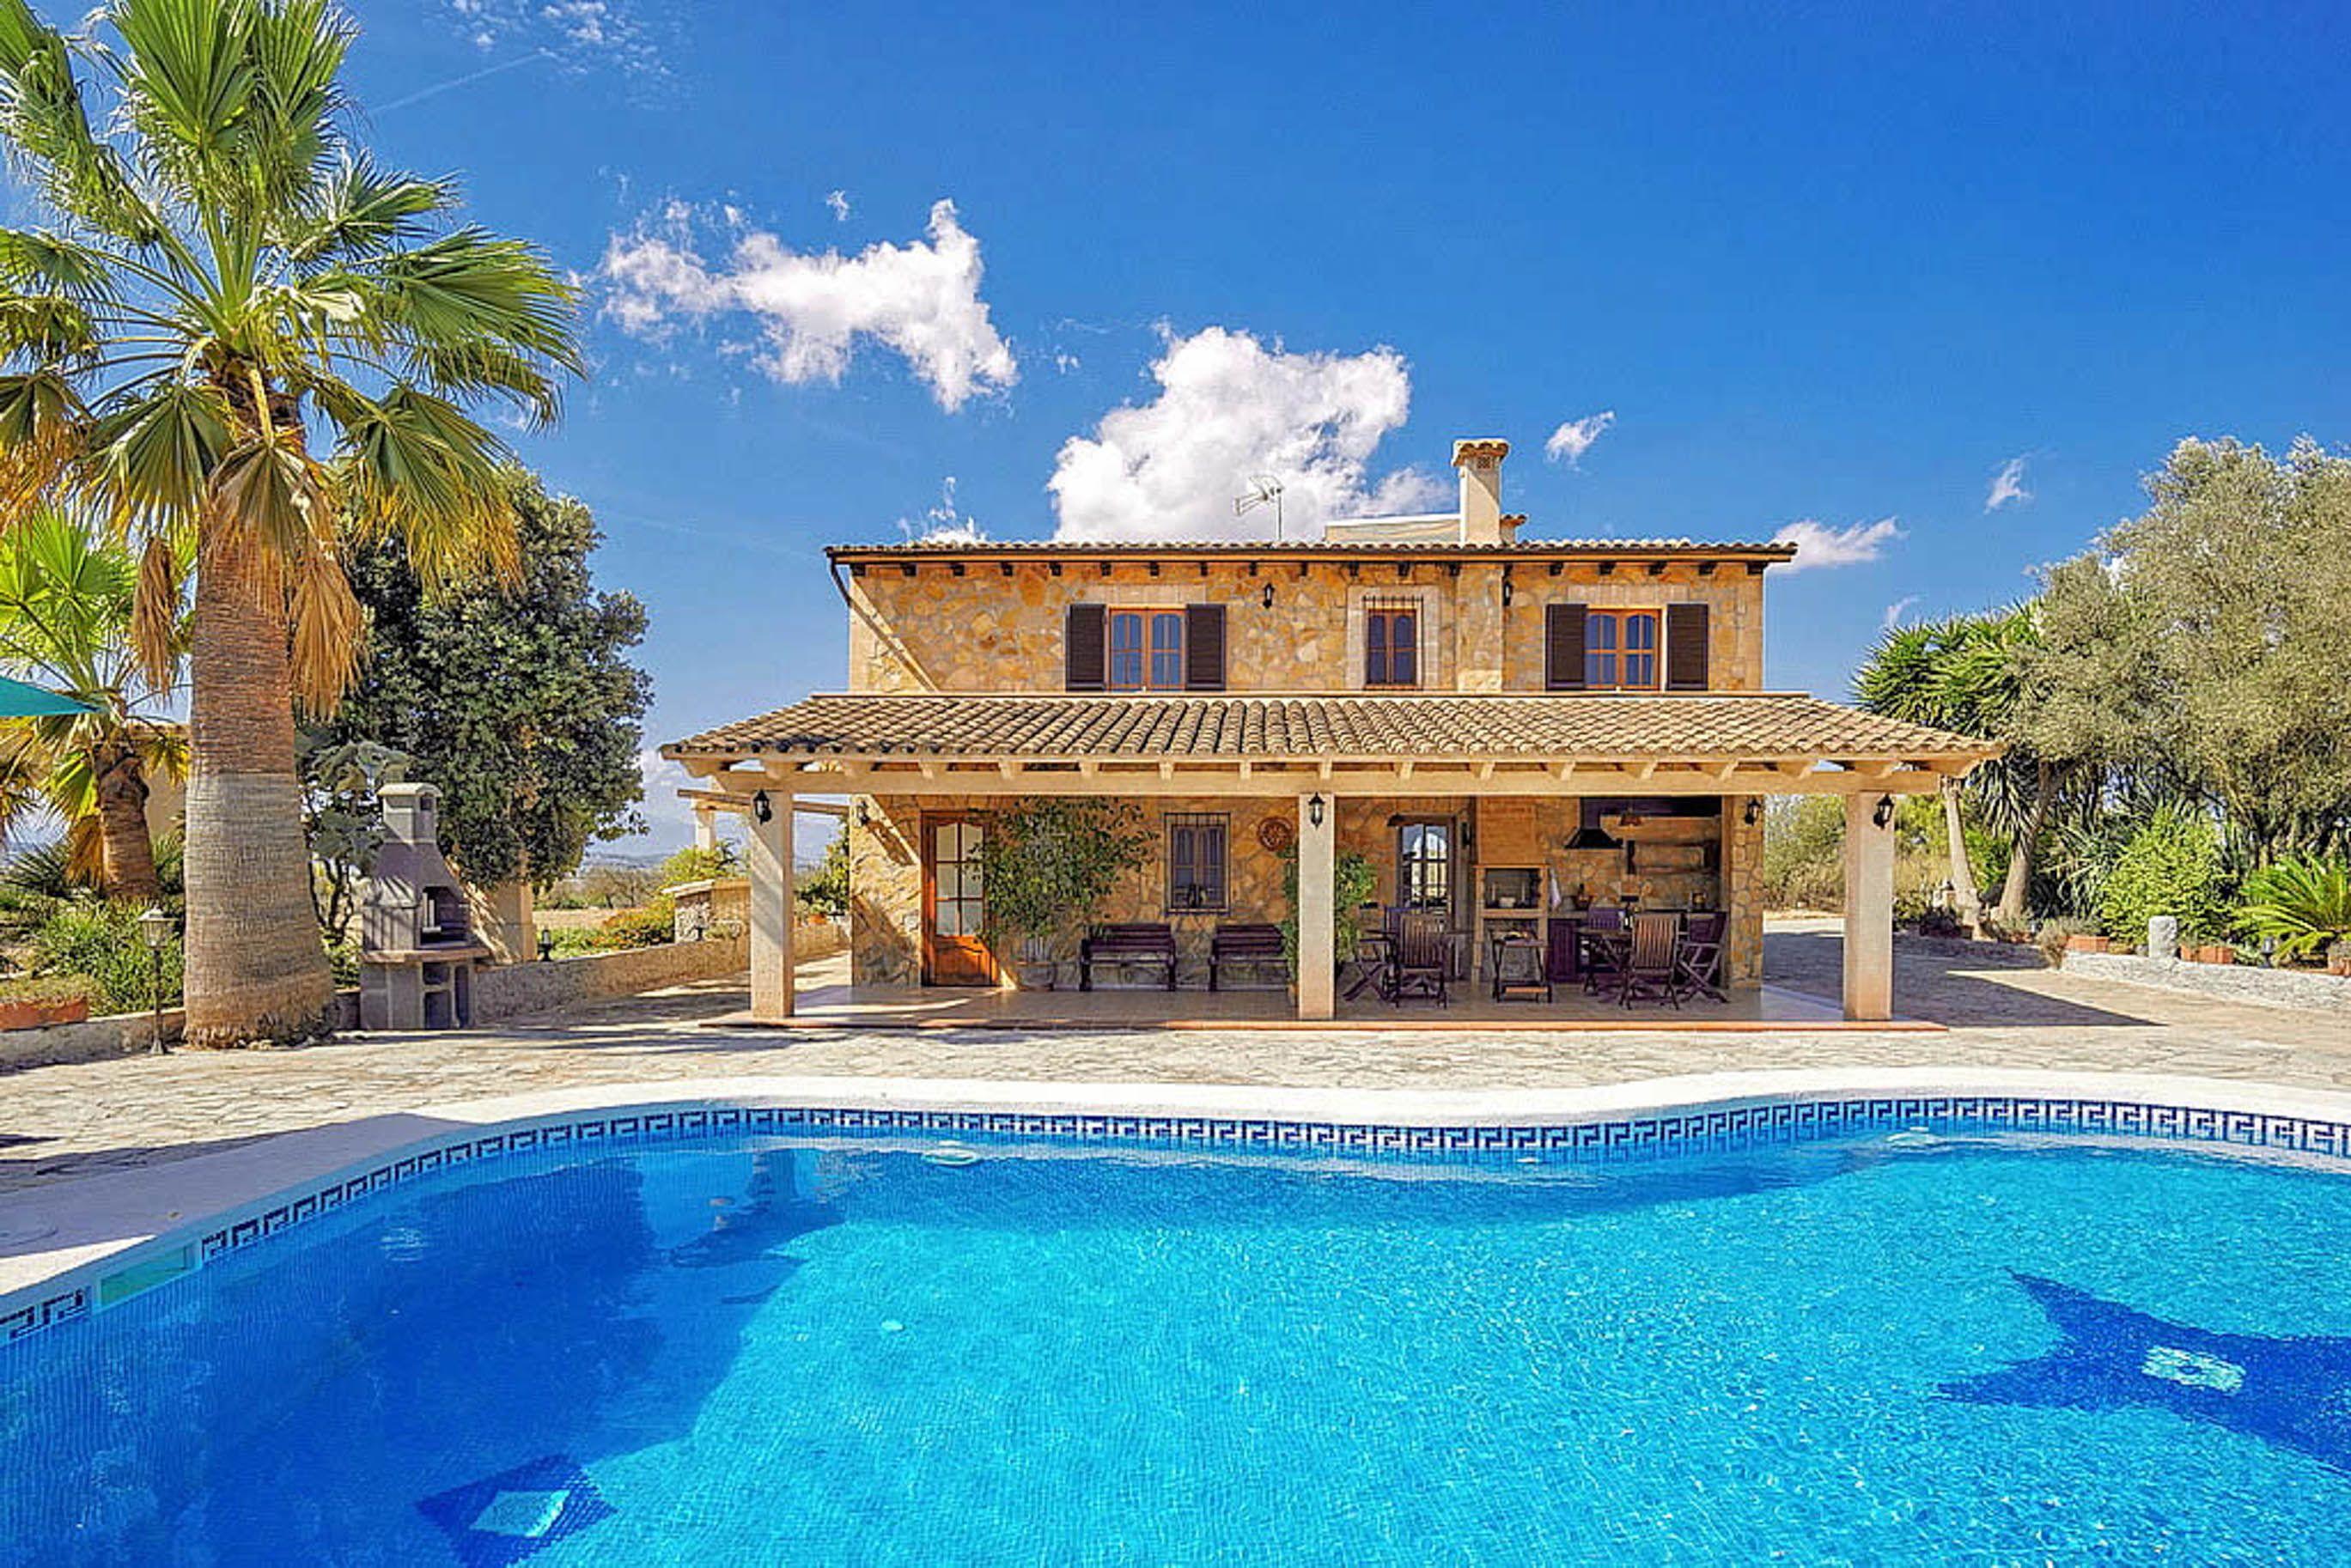 FincaUrlaub auf Mallorca Mallorca urlaub, Ferienhaus